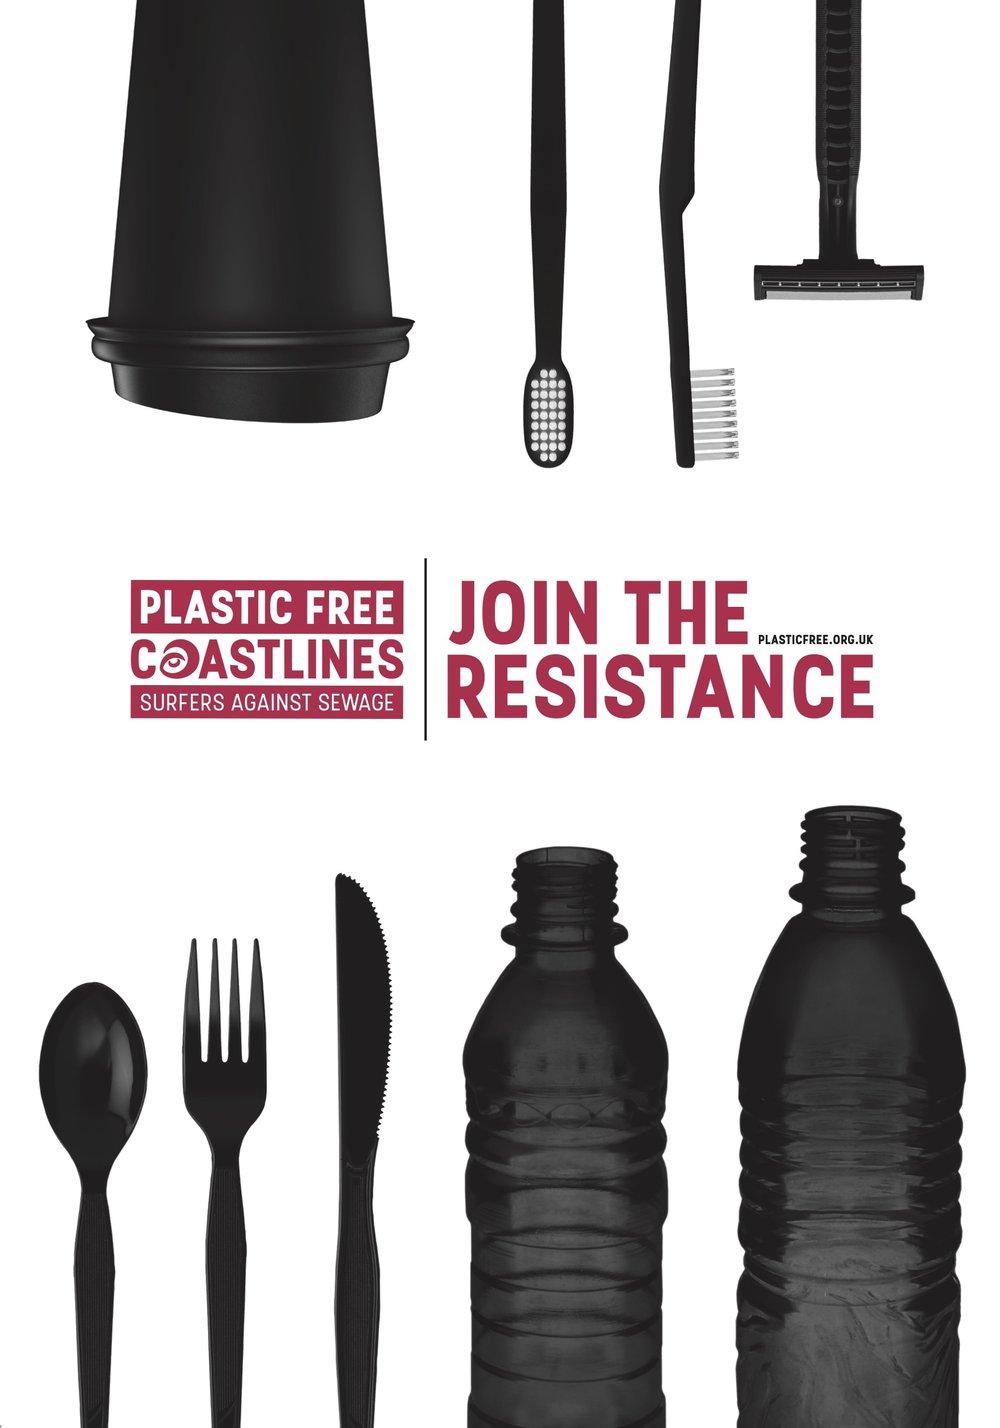 Plastic Free Coastlines 2017 - present